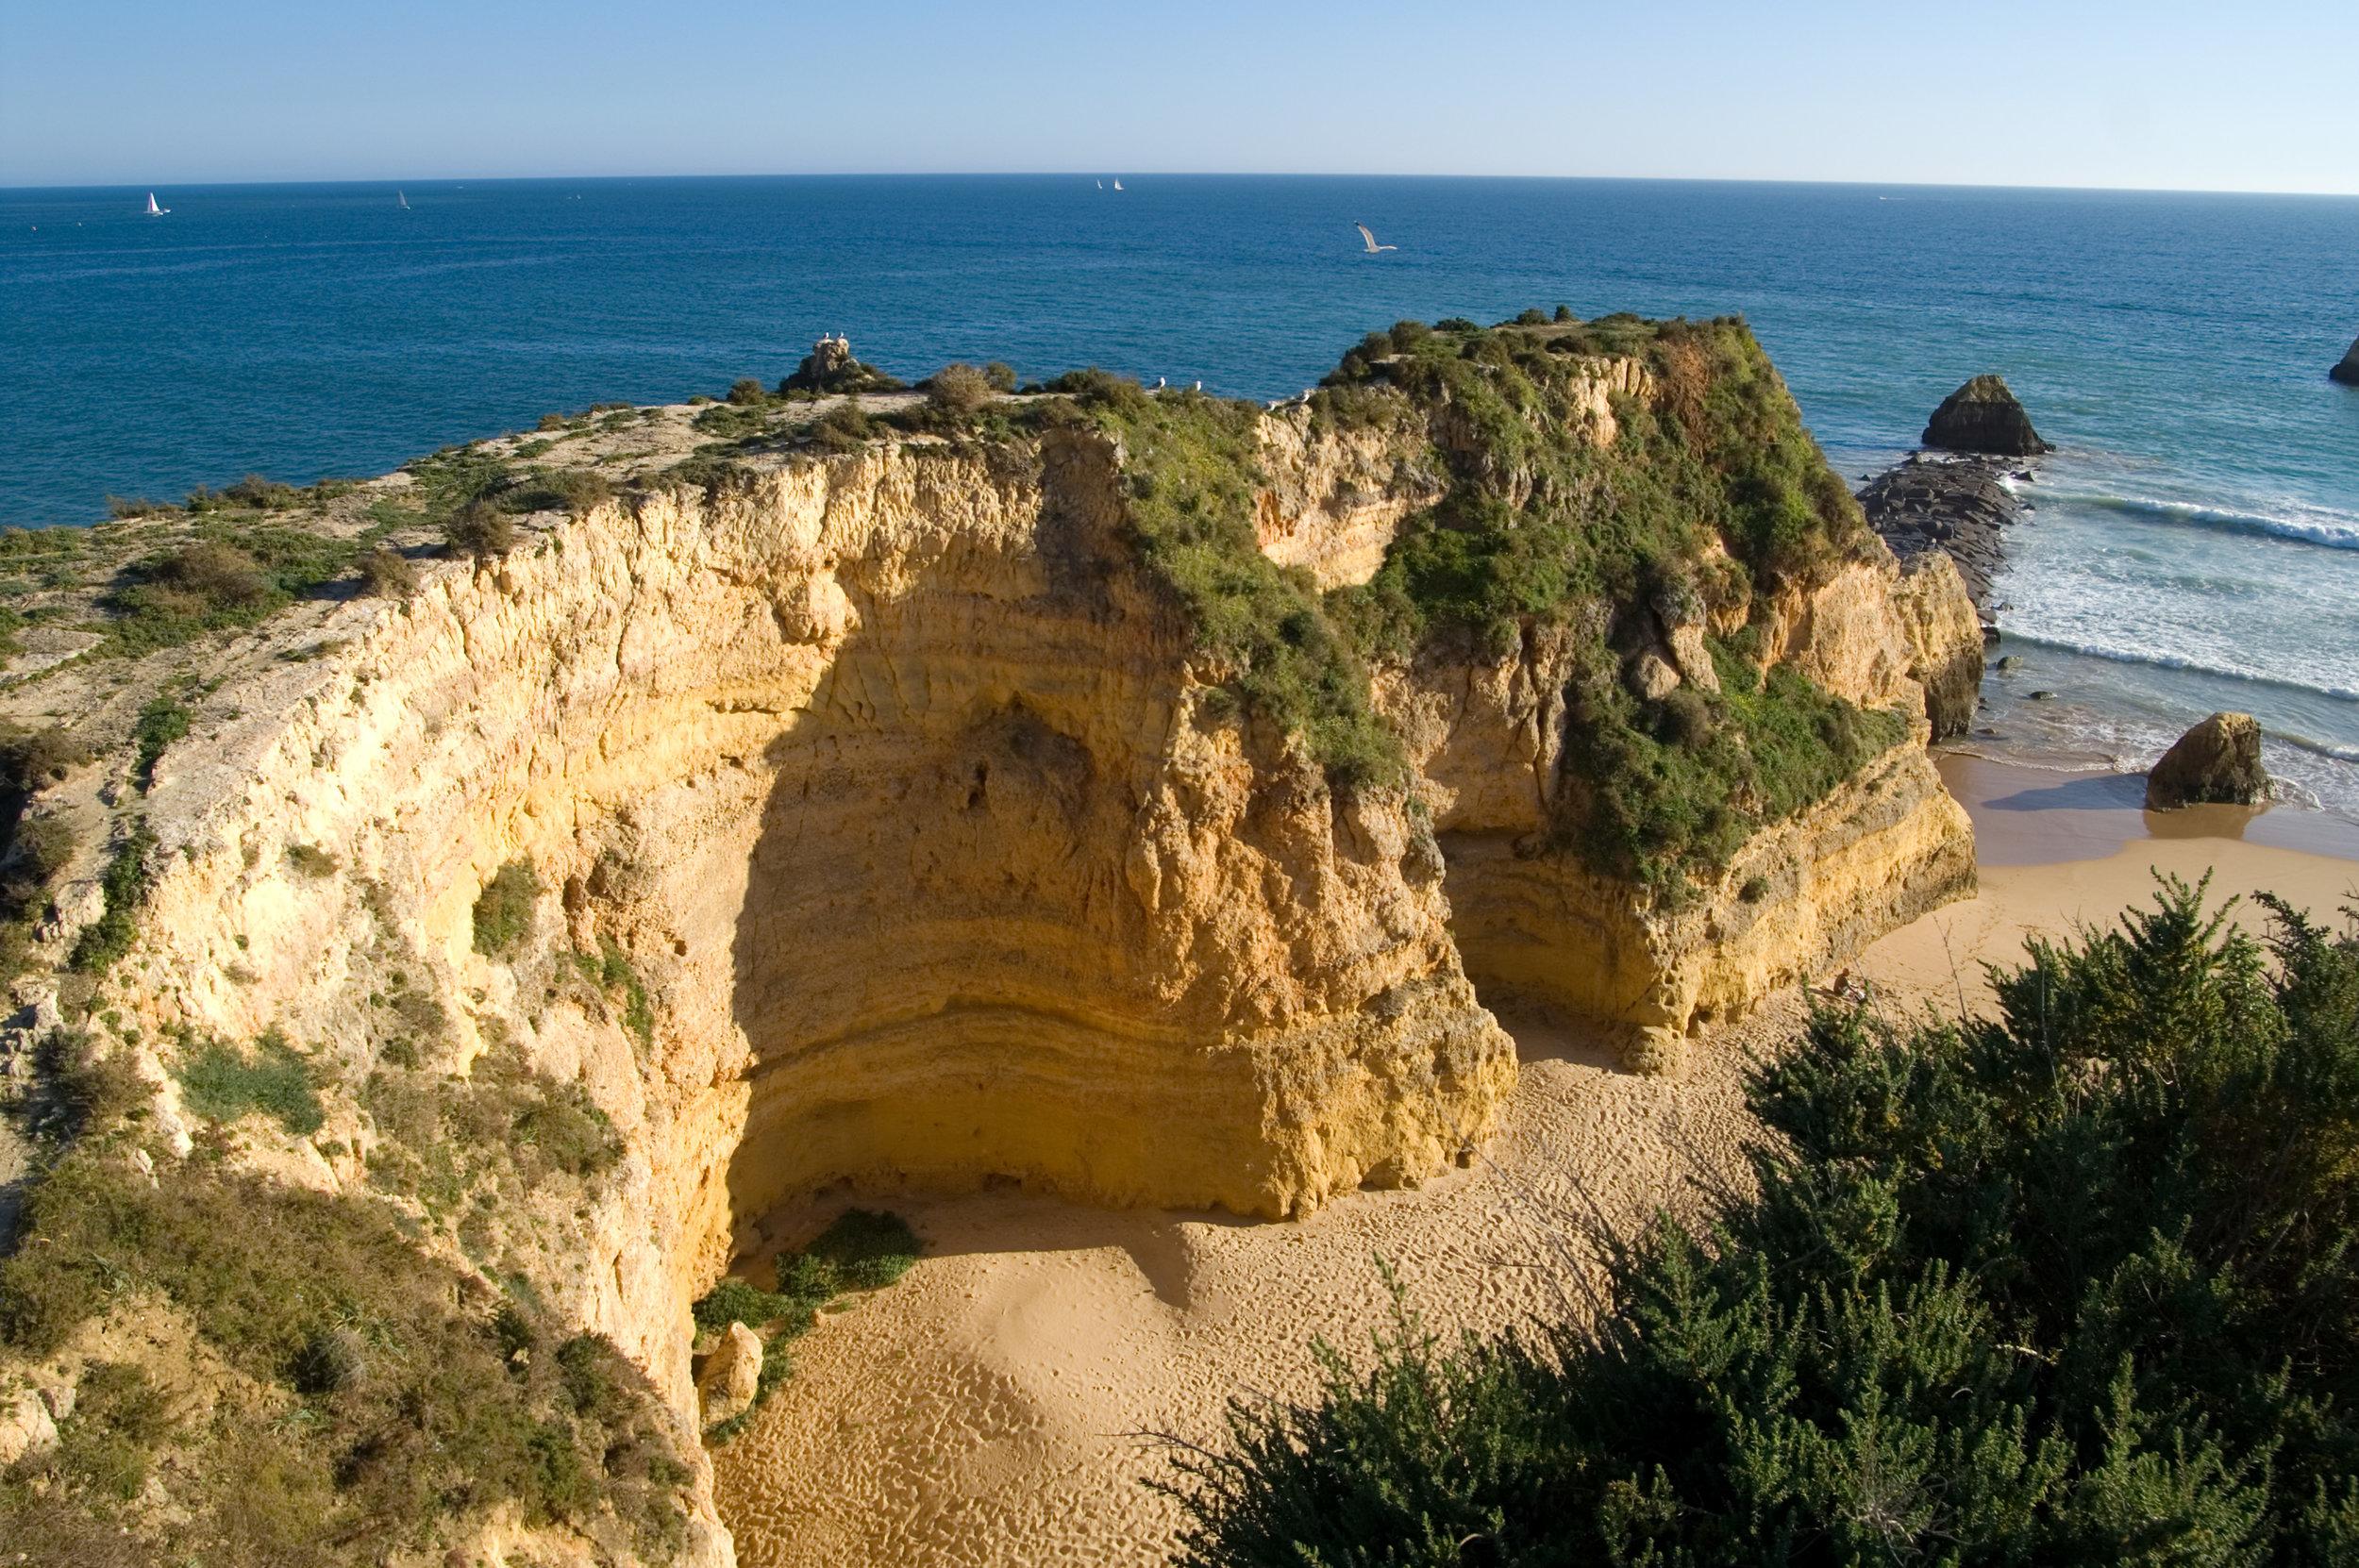 The Algarve's rocky Praia da Rocha beach is certainly worth visiting. Image credit:  Mechel / Creative Commons